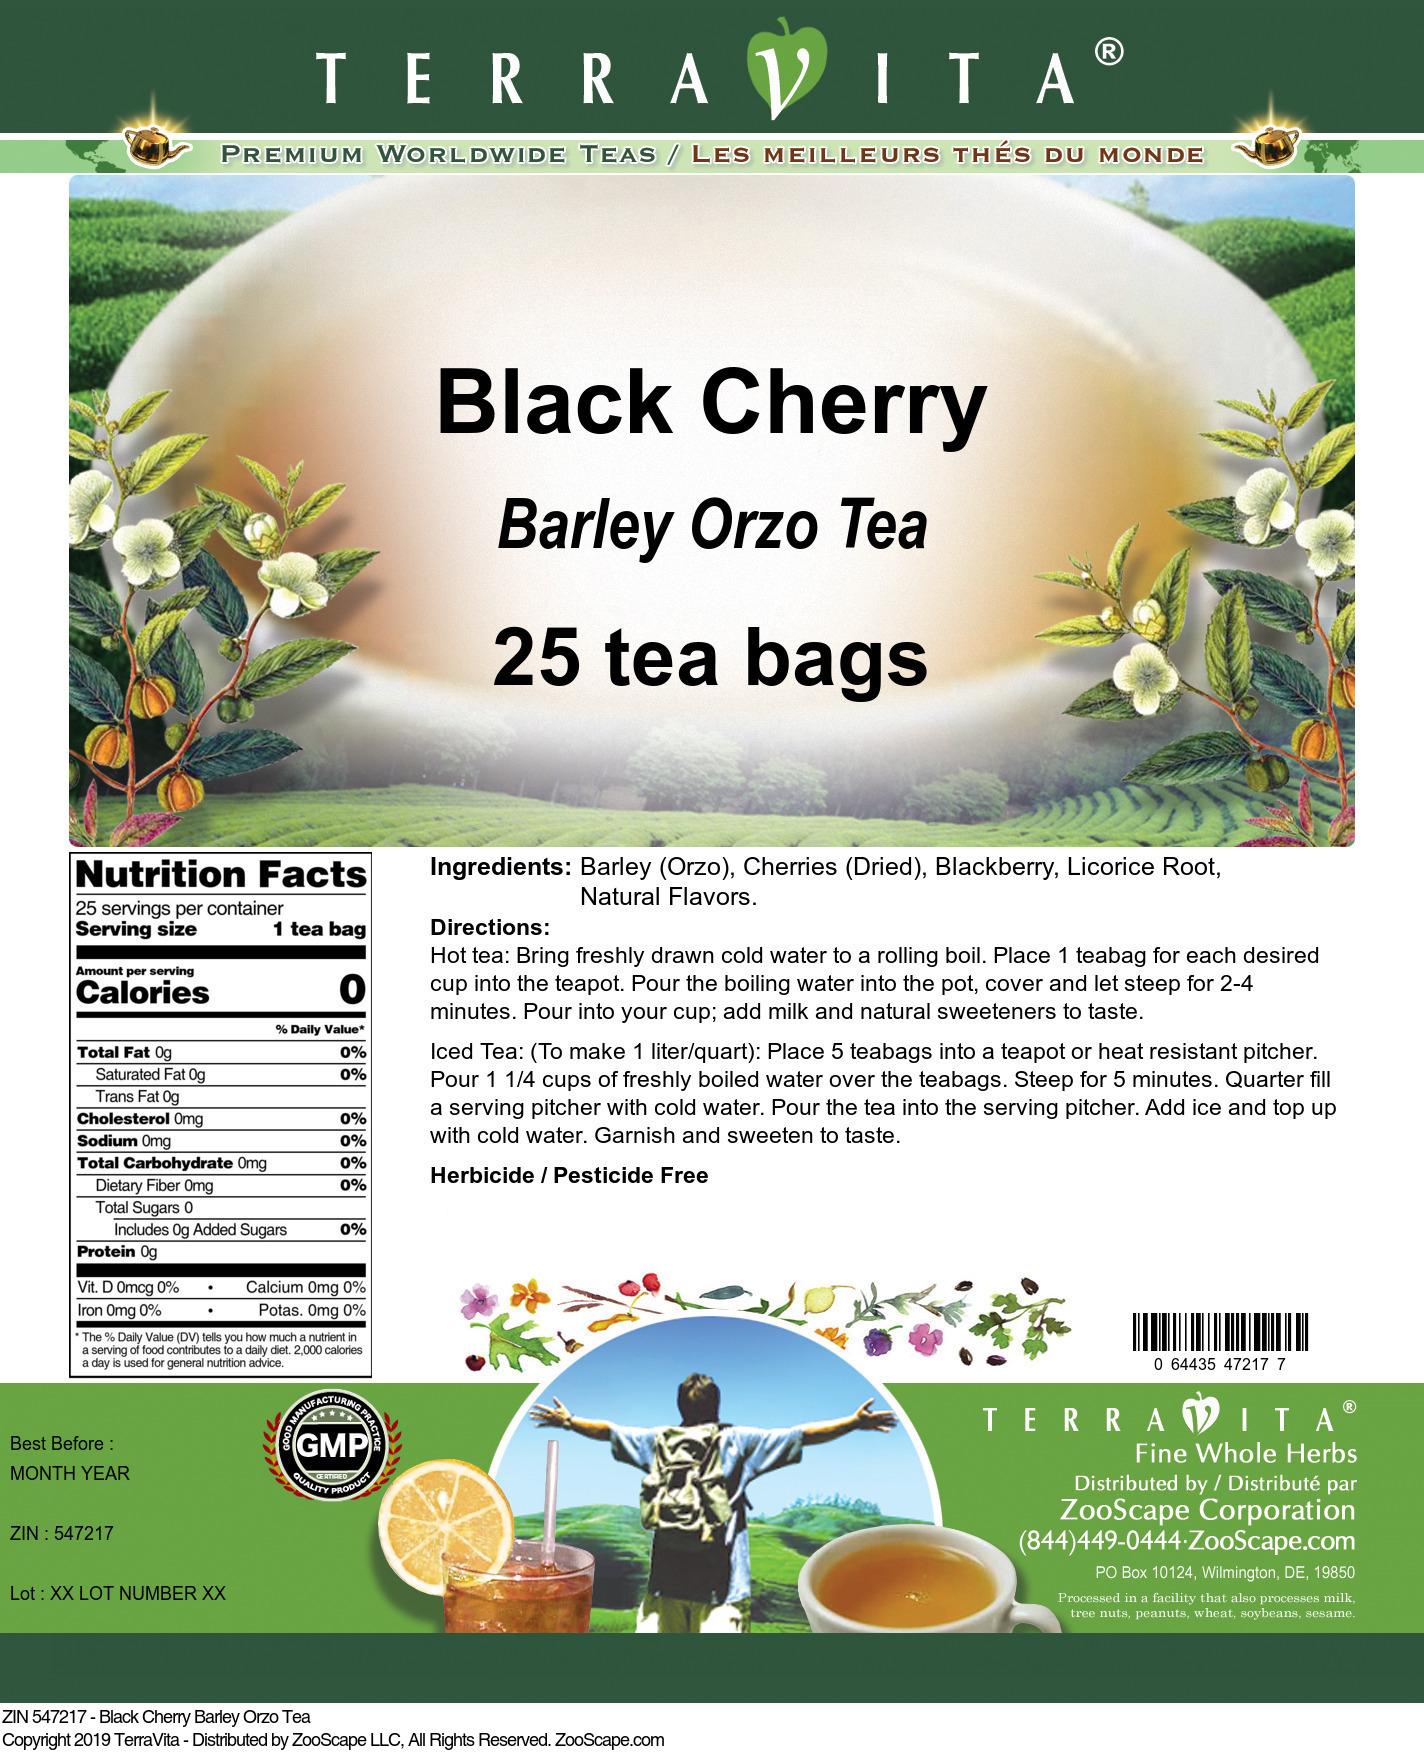 Black Cherry Barley Orzo